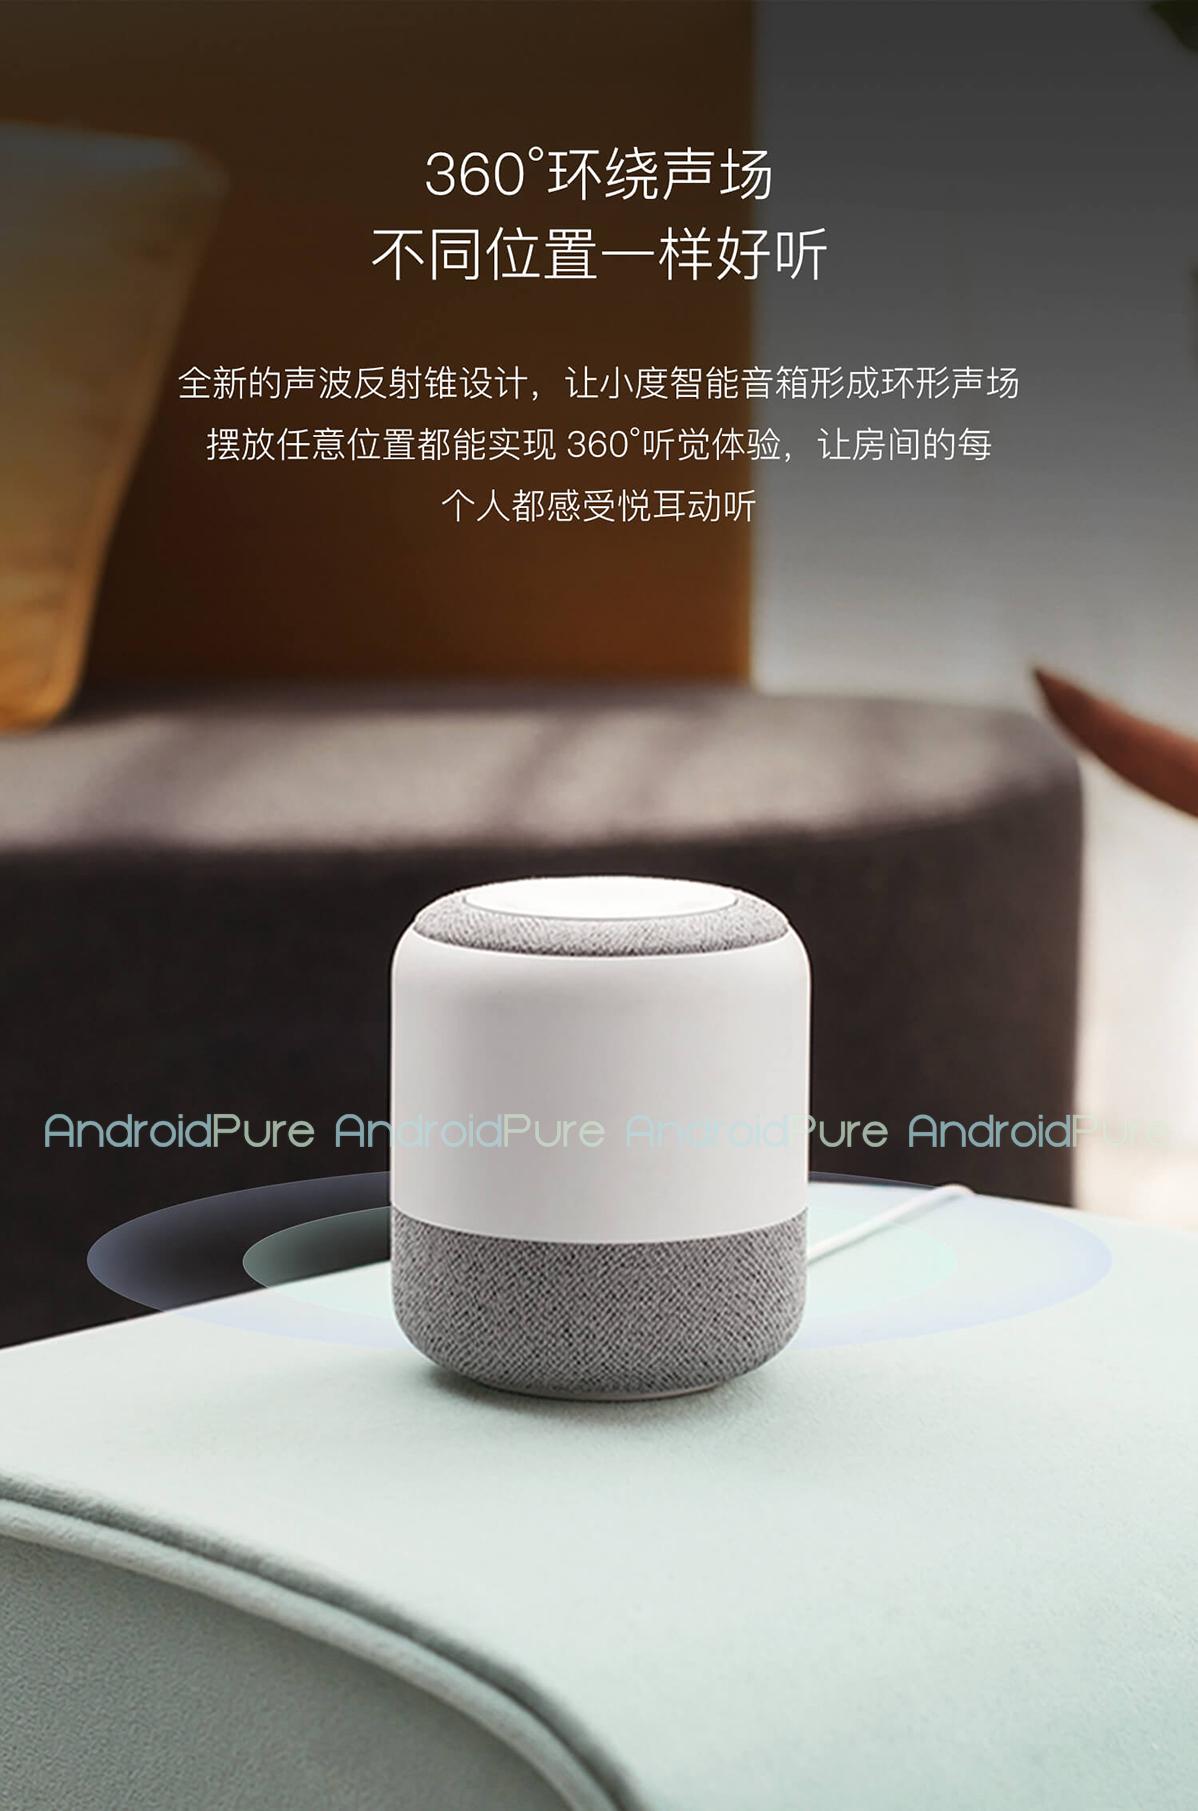 Moto AI Speakers Amazon Echo5 All about Motorola AI Assistant speakers, like Amazon Echo or Google Mini [Updated] 1